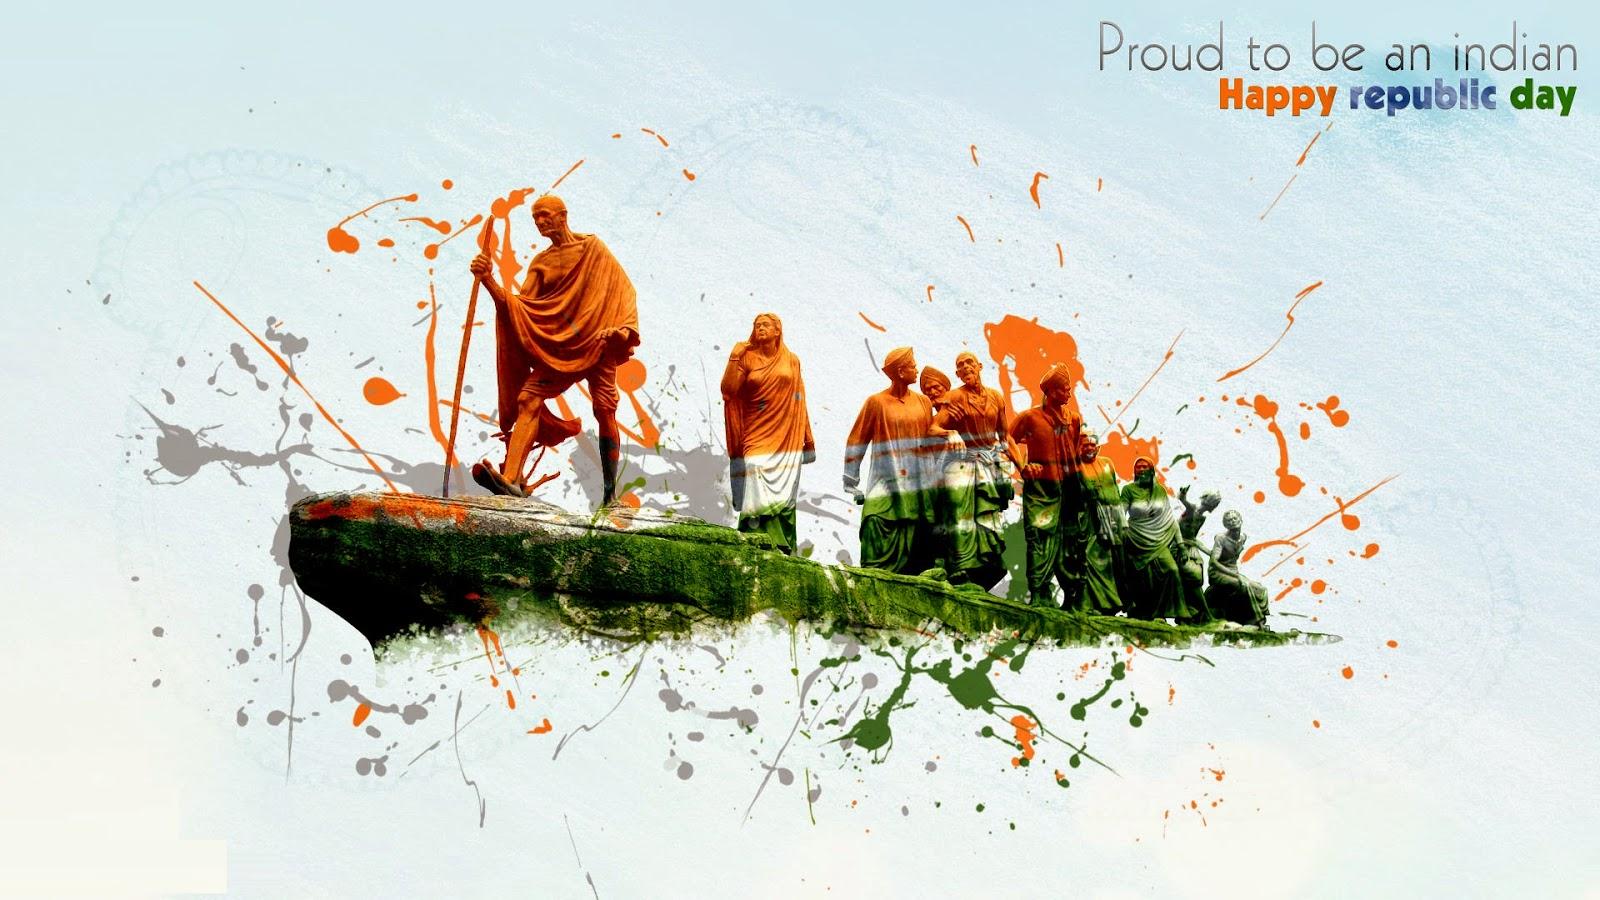 Gandhiji Happy Republic Day Wallpaper